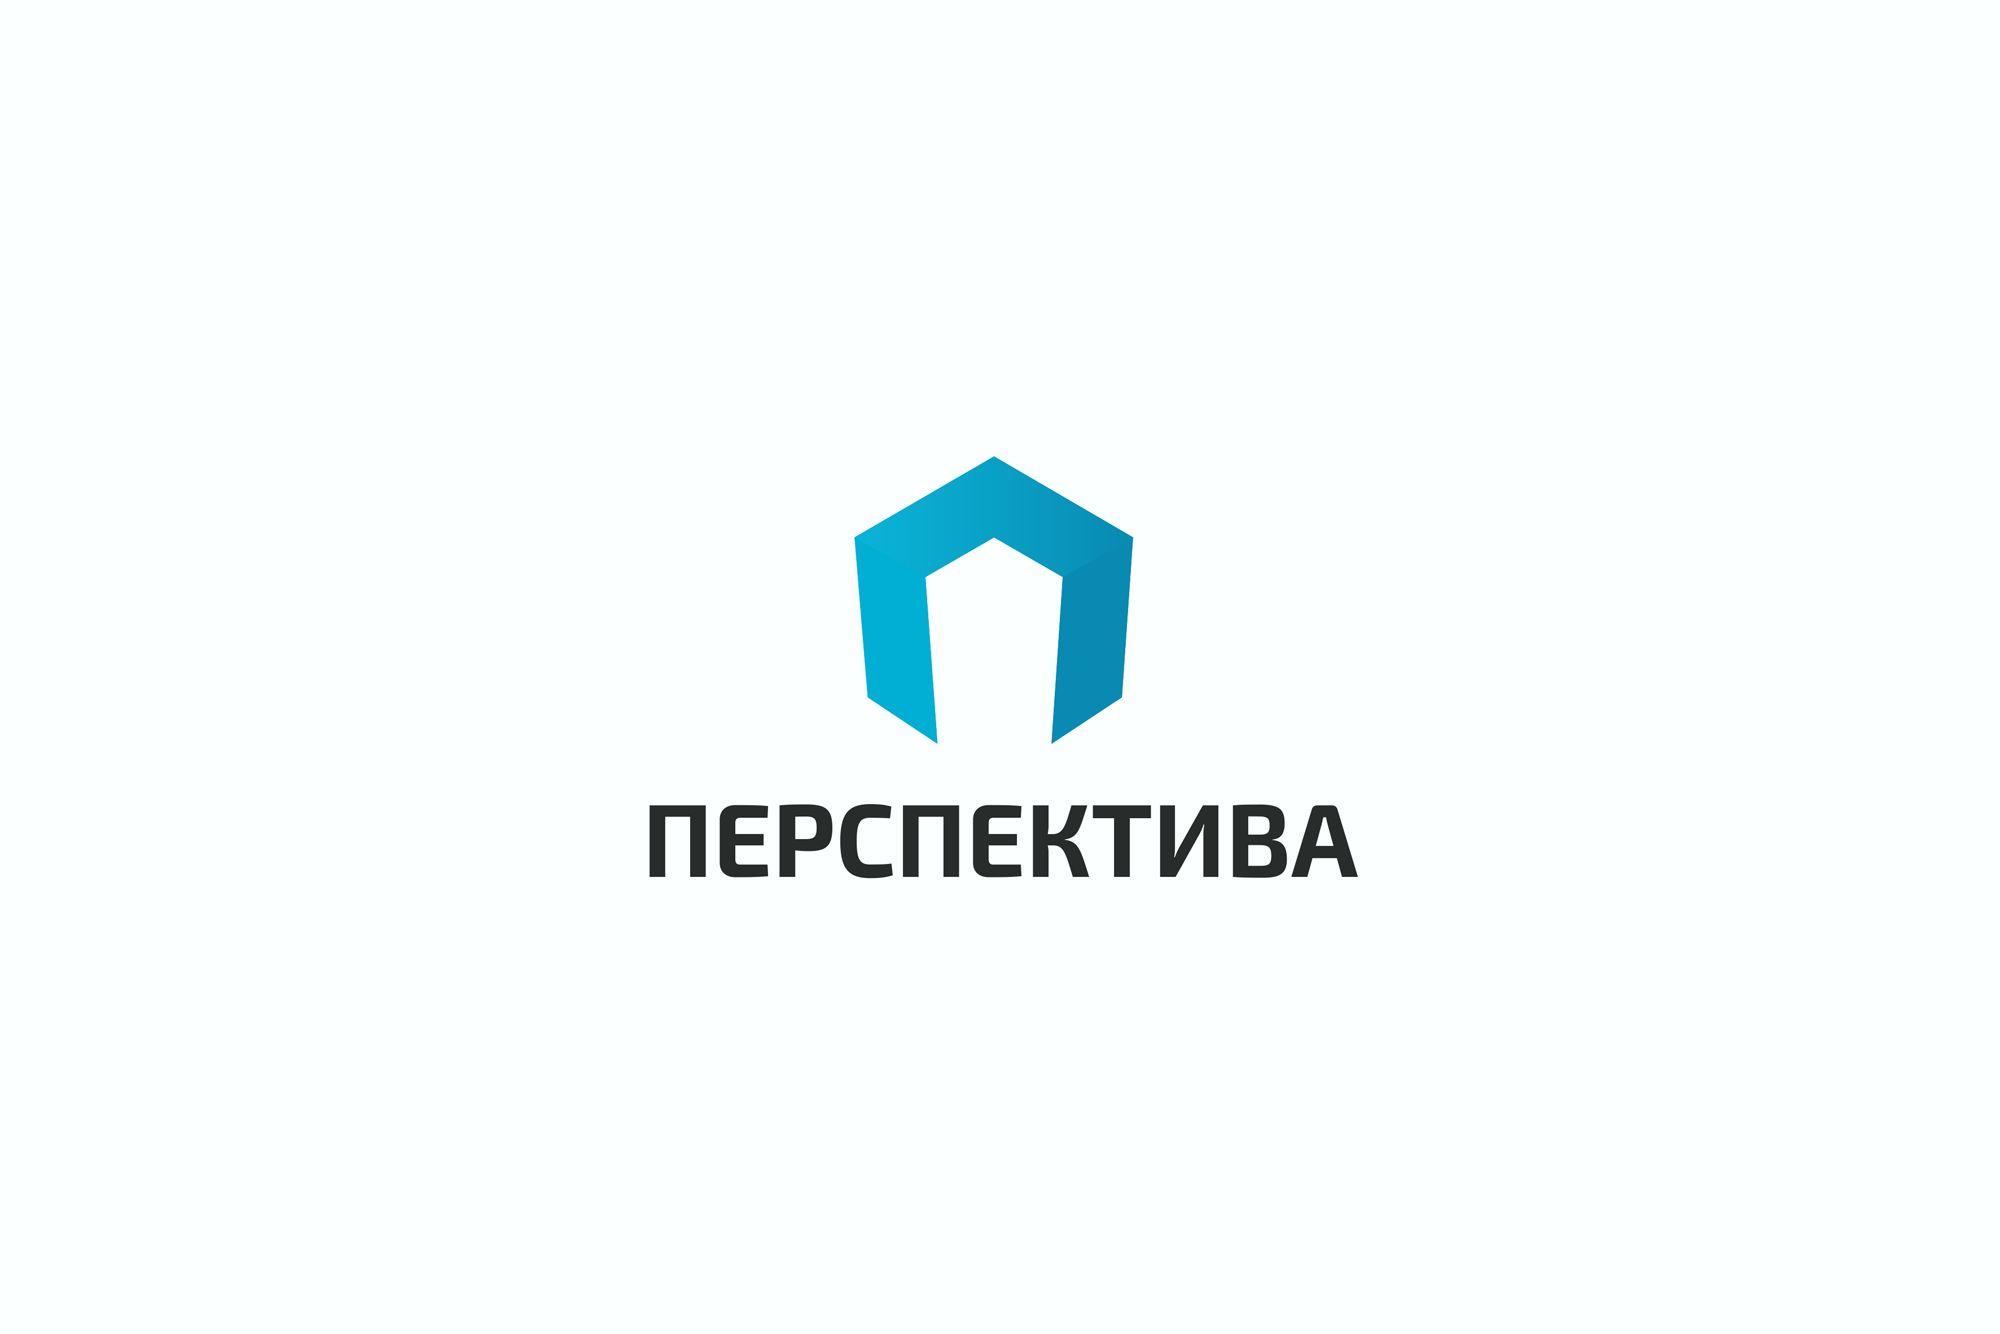 Логотип для компании  - дизайнер yaroslav-s